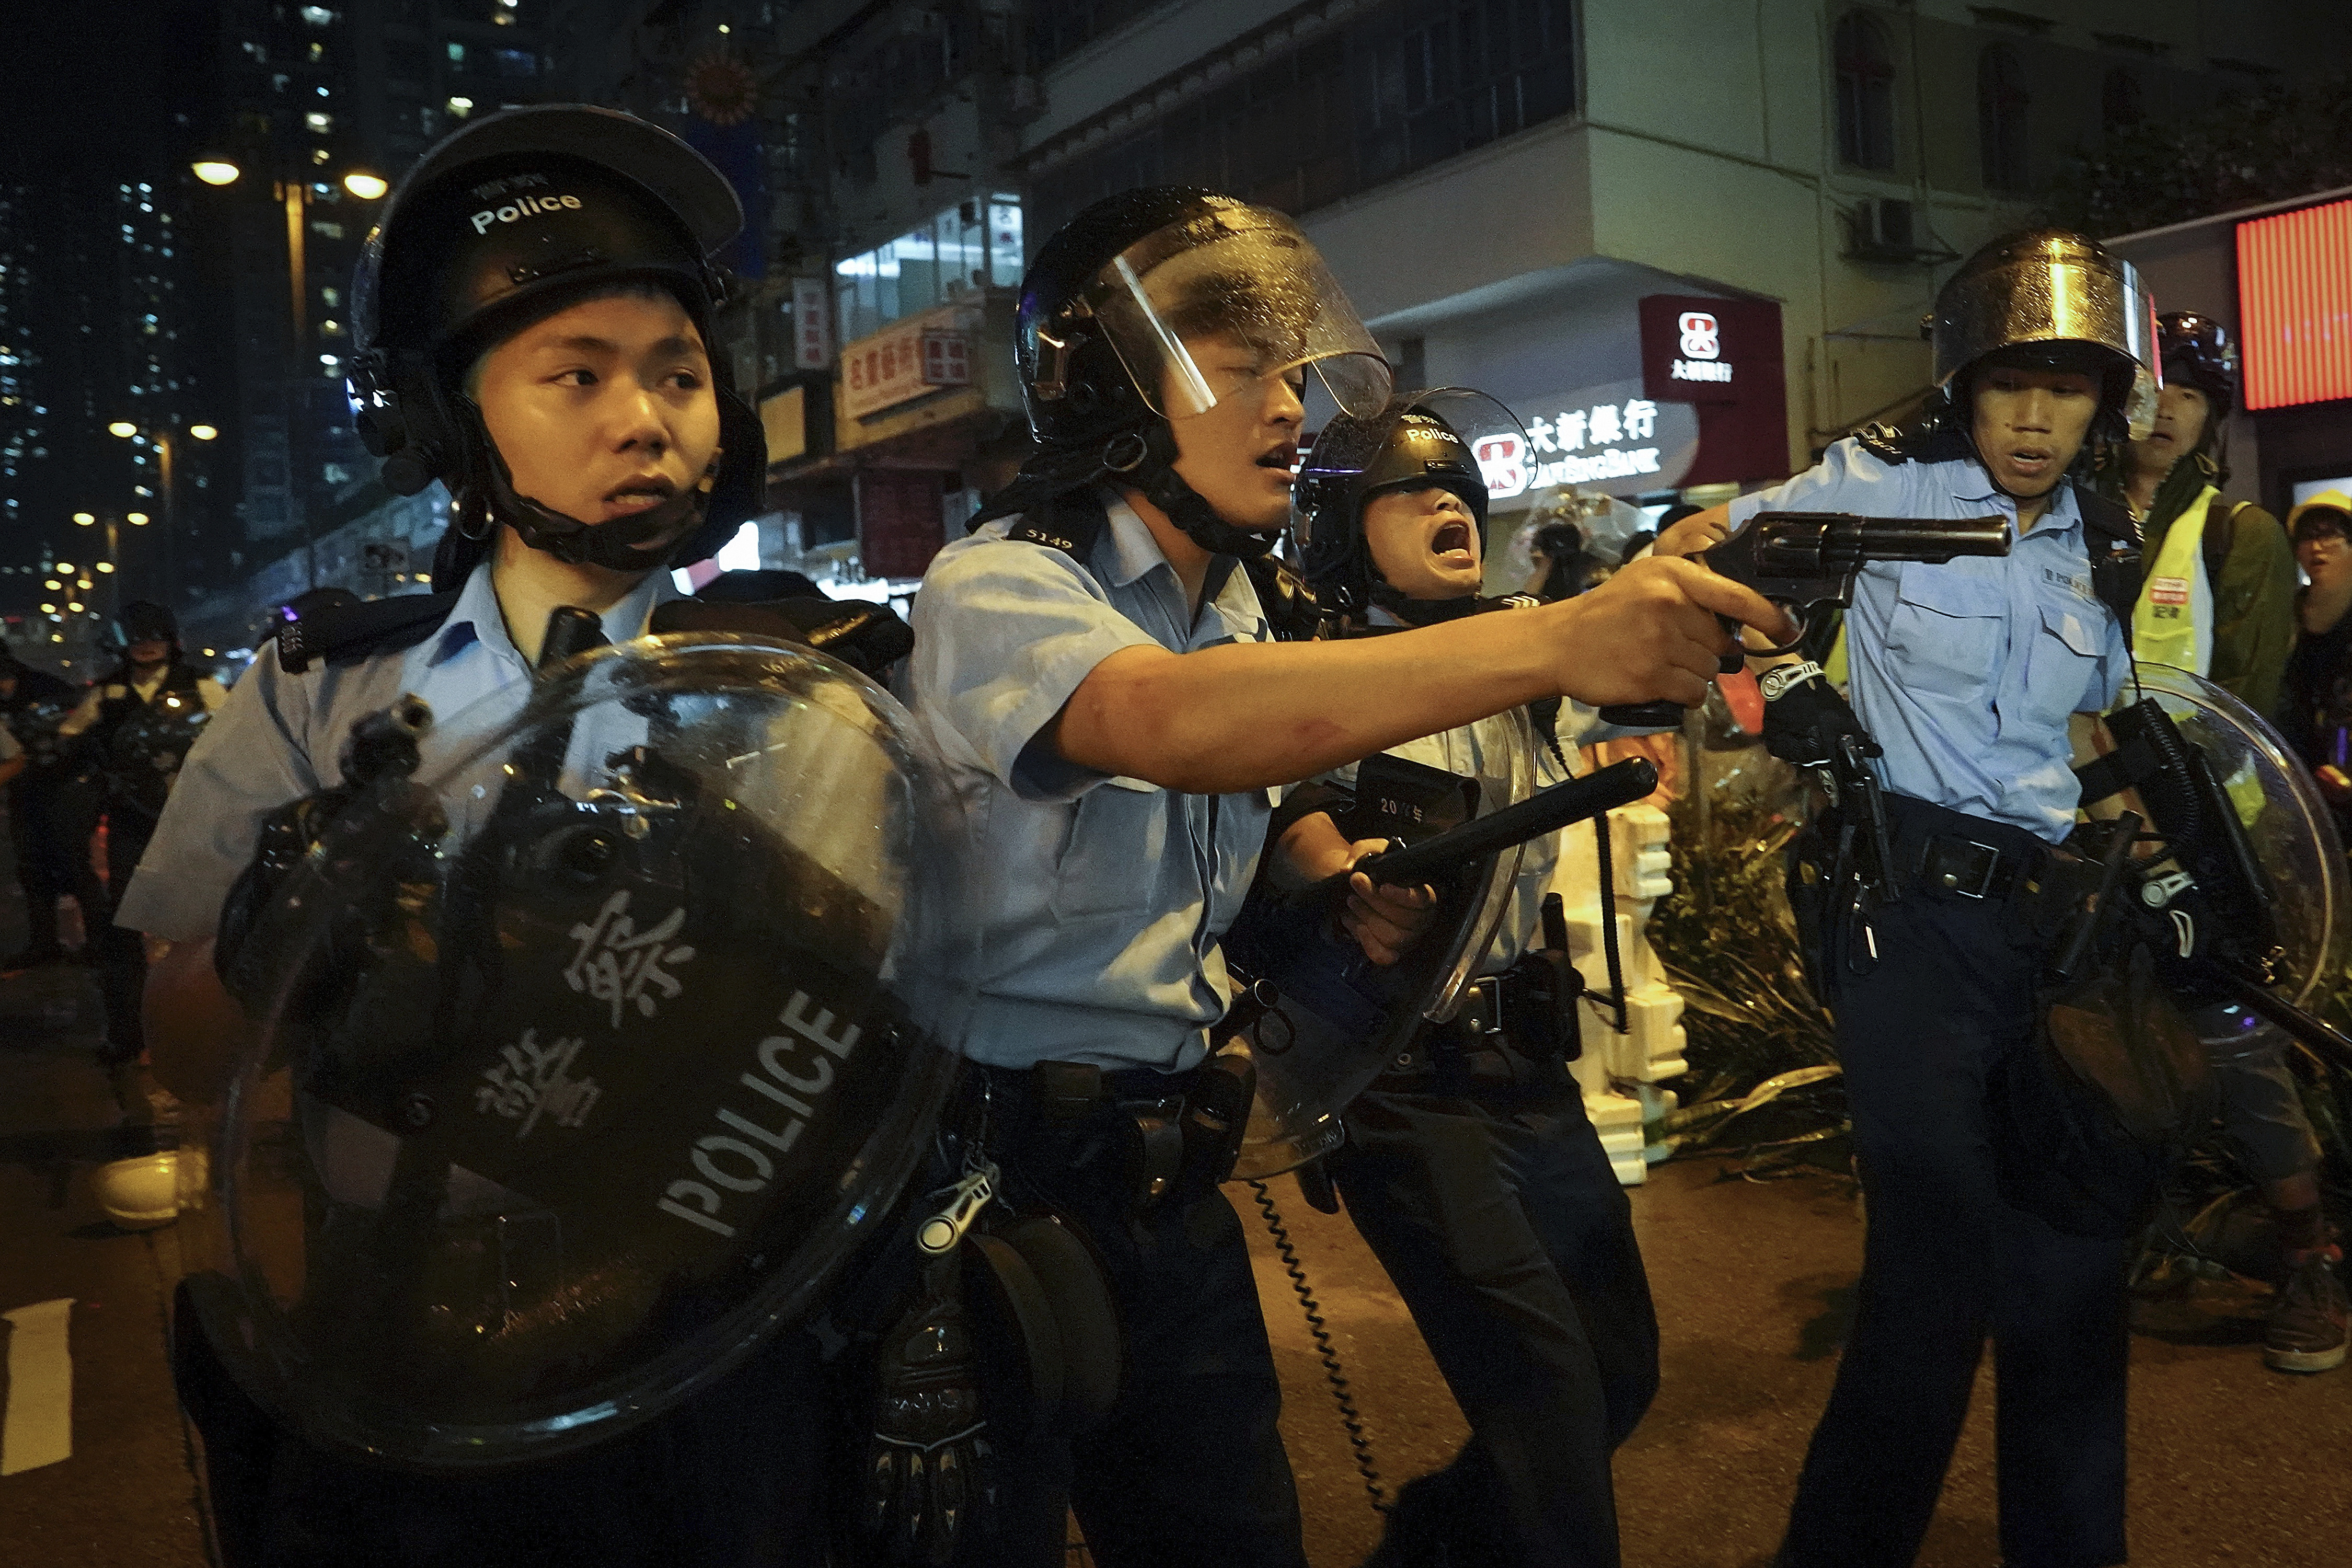 The Latest: Hong Kong police confirm warning shot, arrest 36